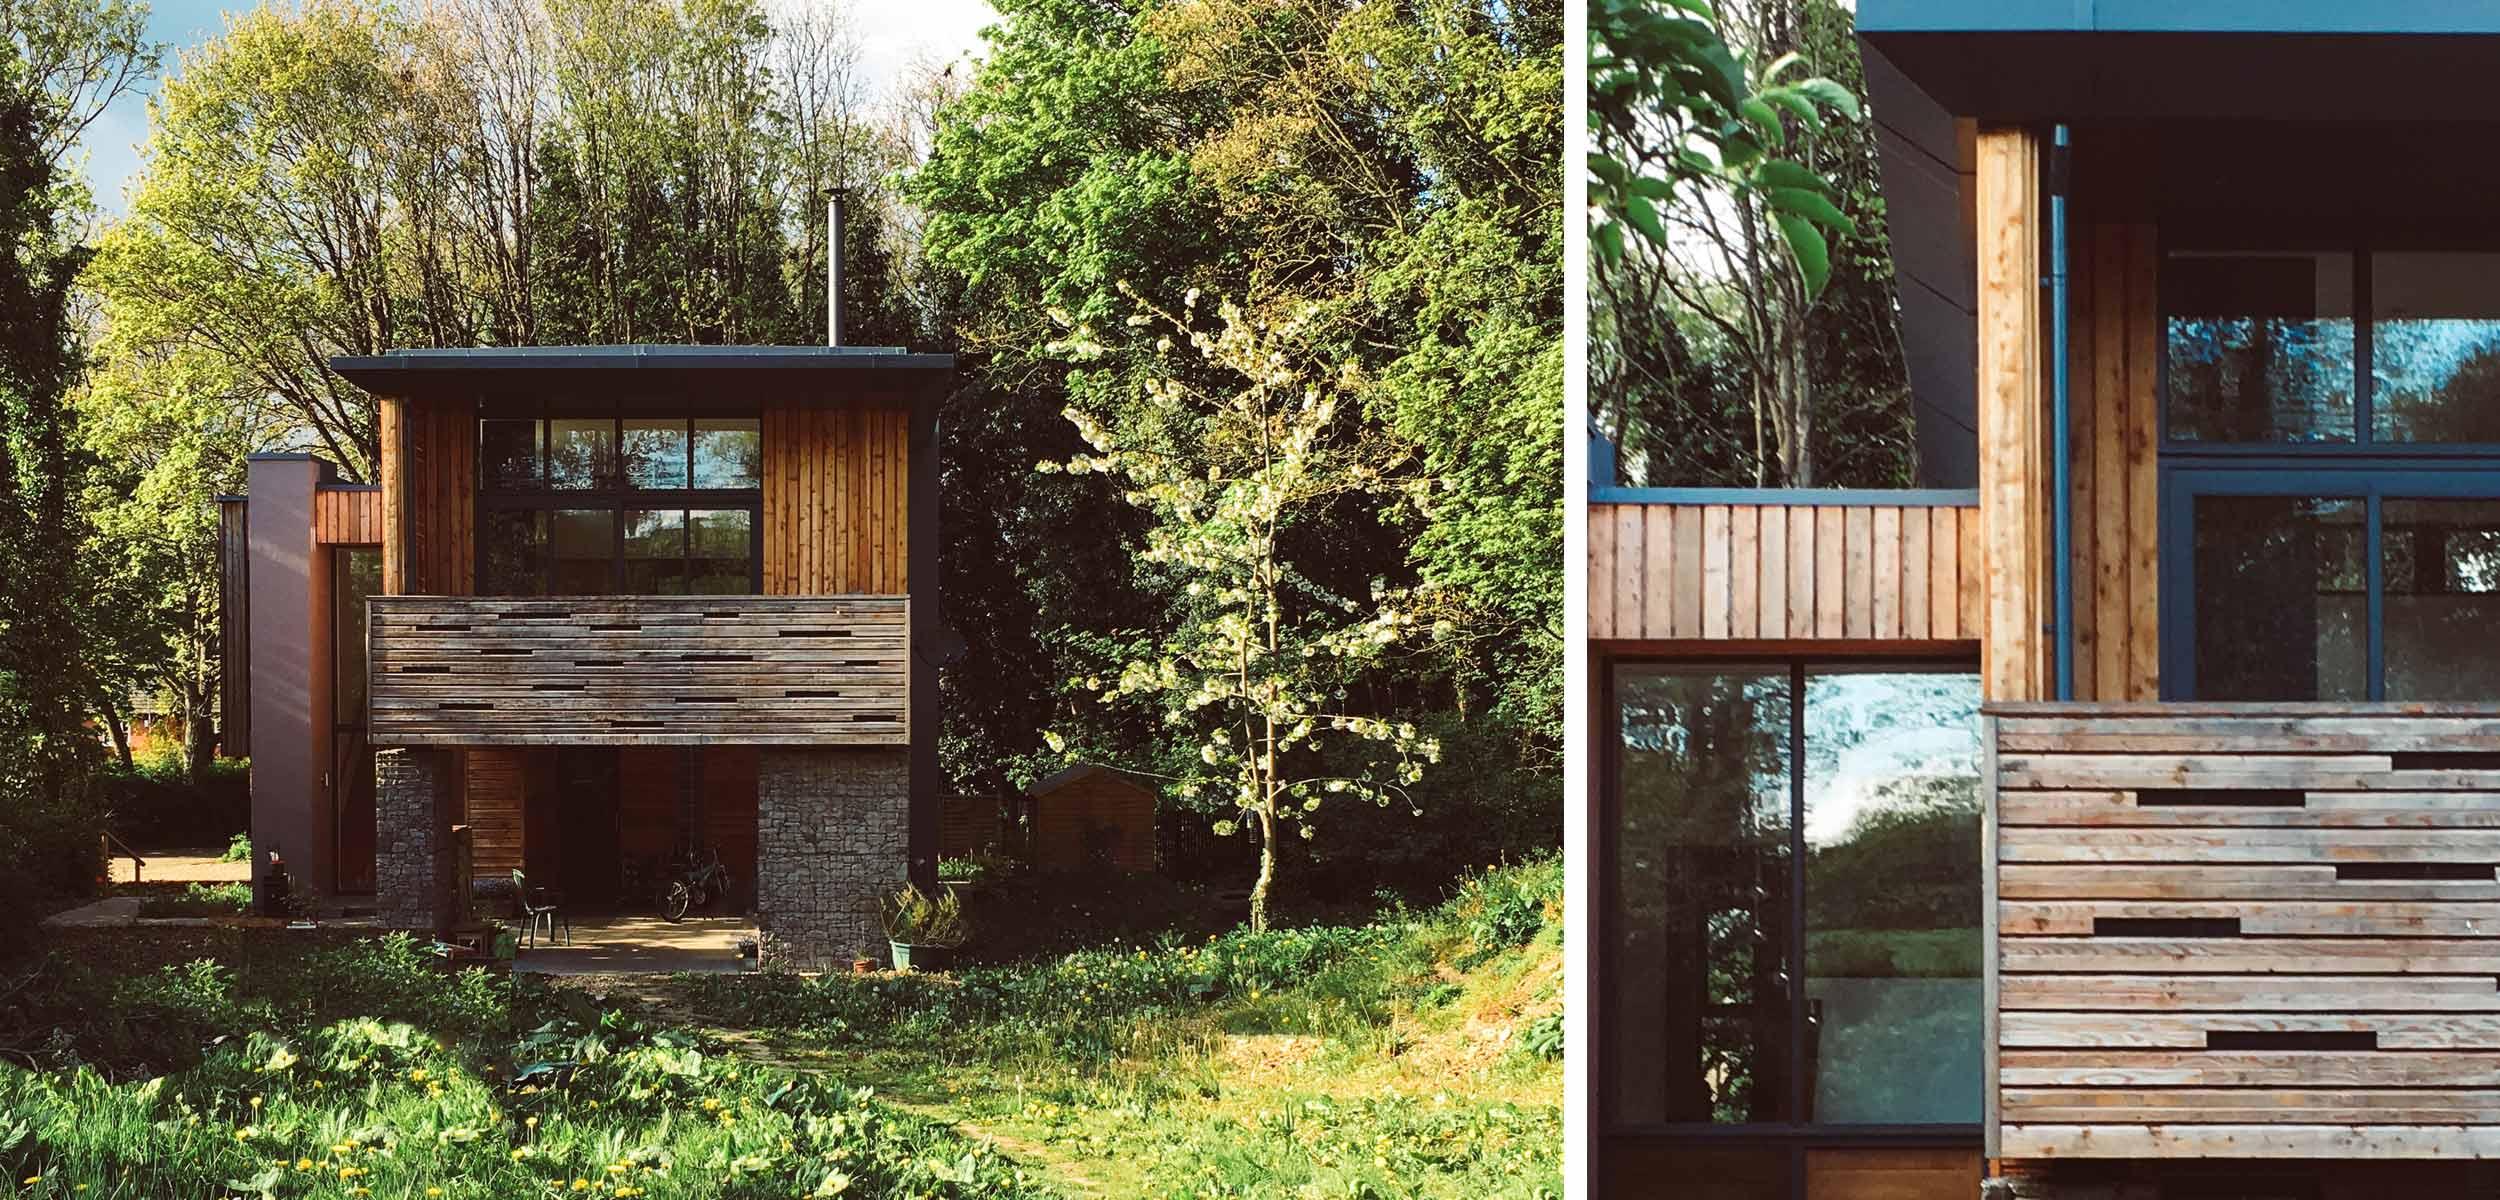 birmingham_architects_01.jpg